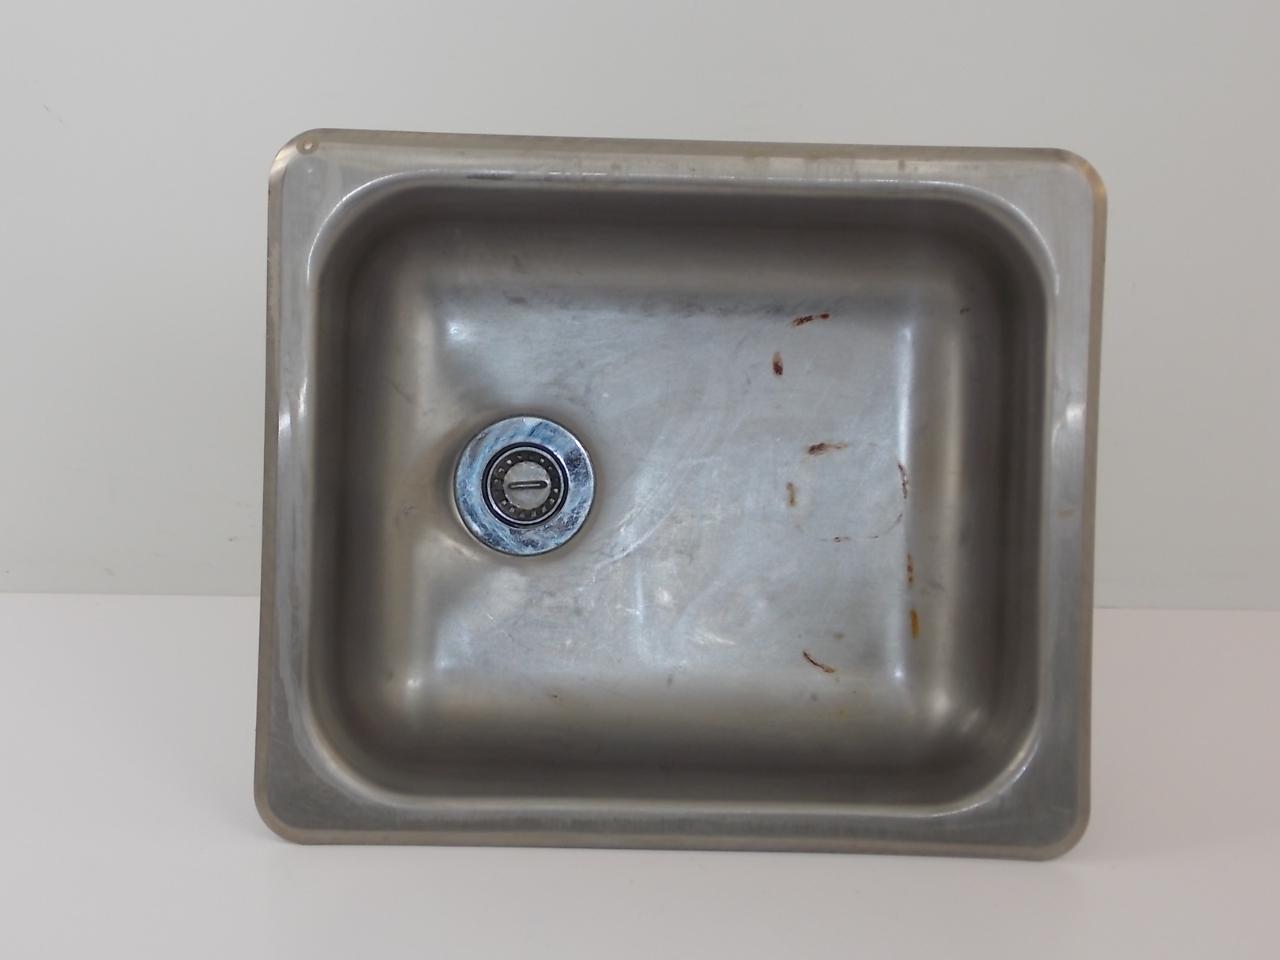 bayliner boat marine rv camper compact sink polar type 300 series